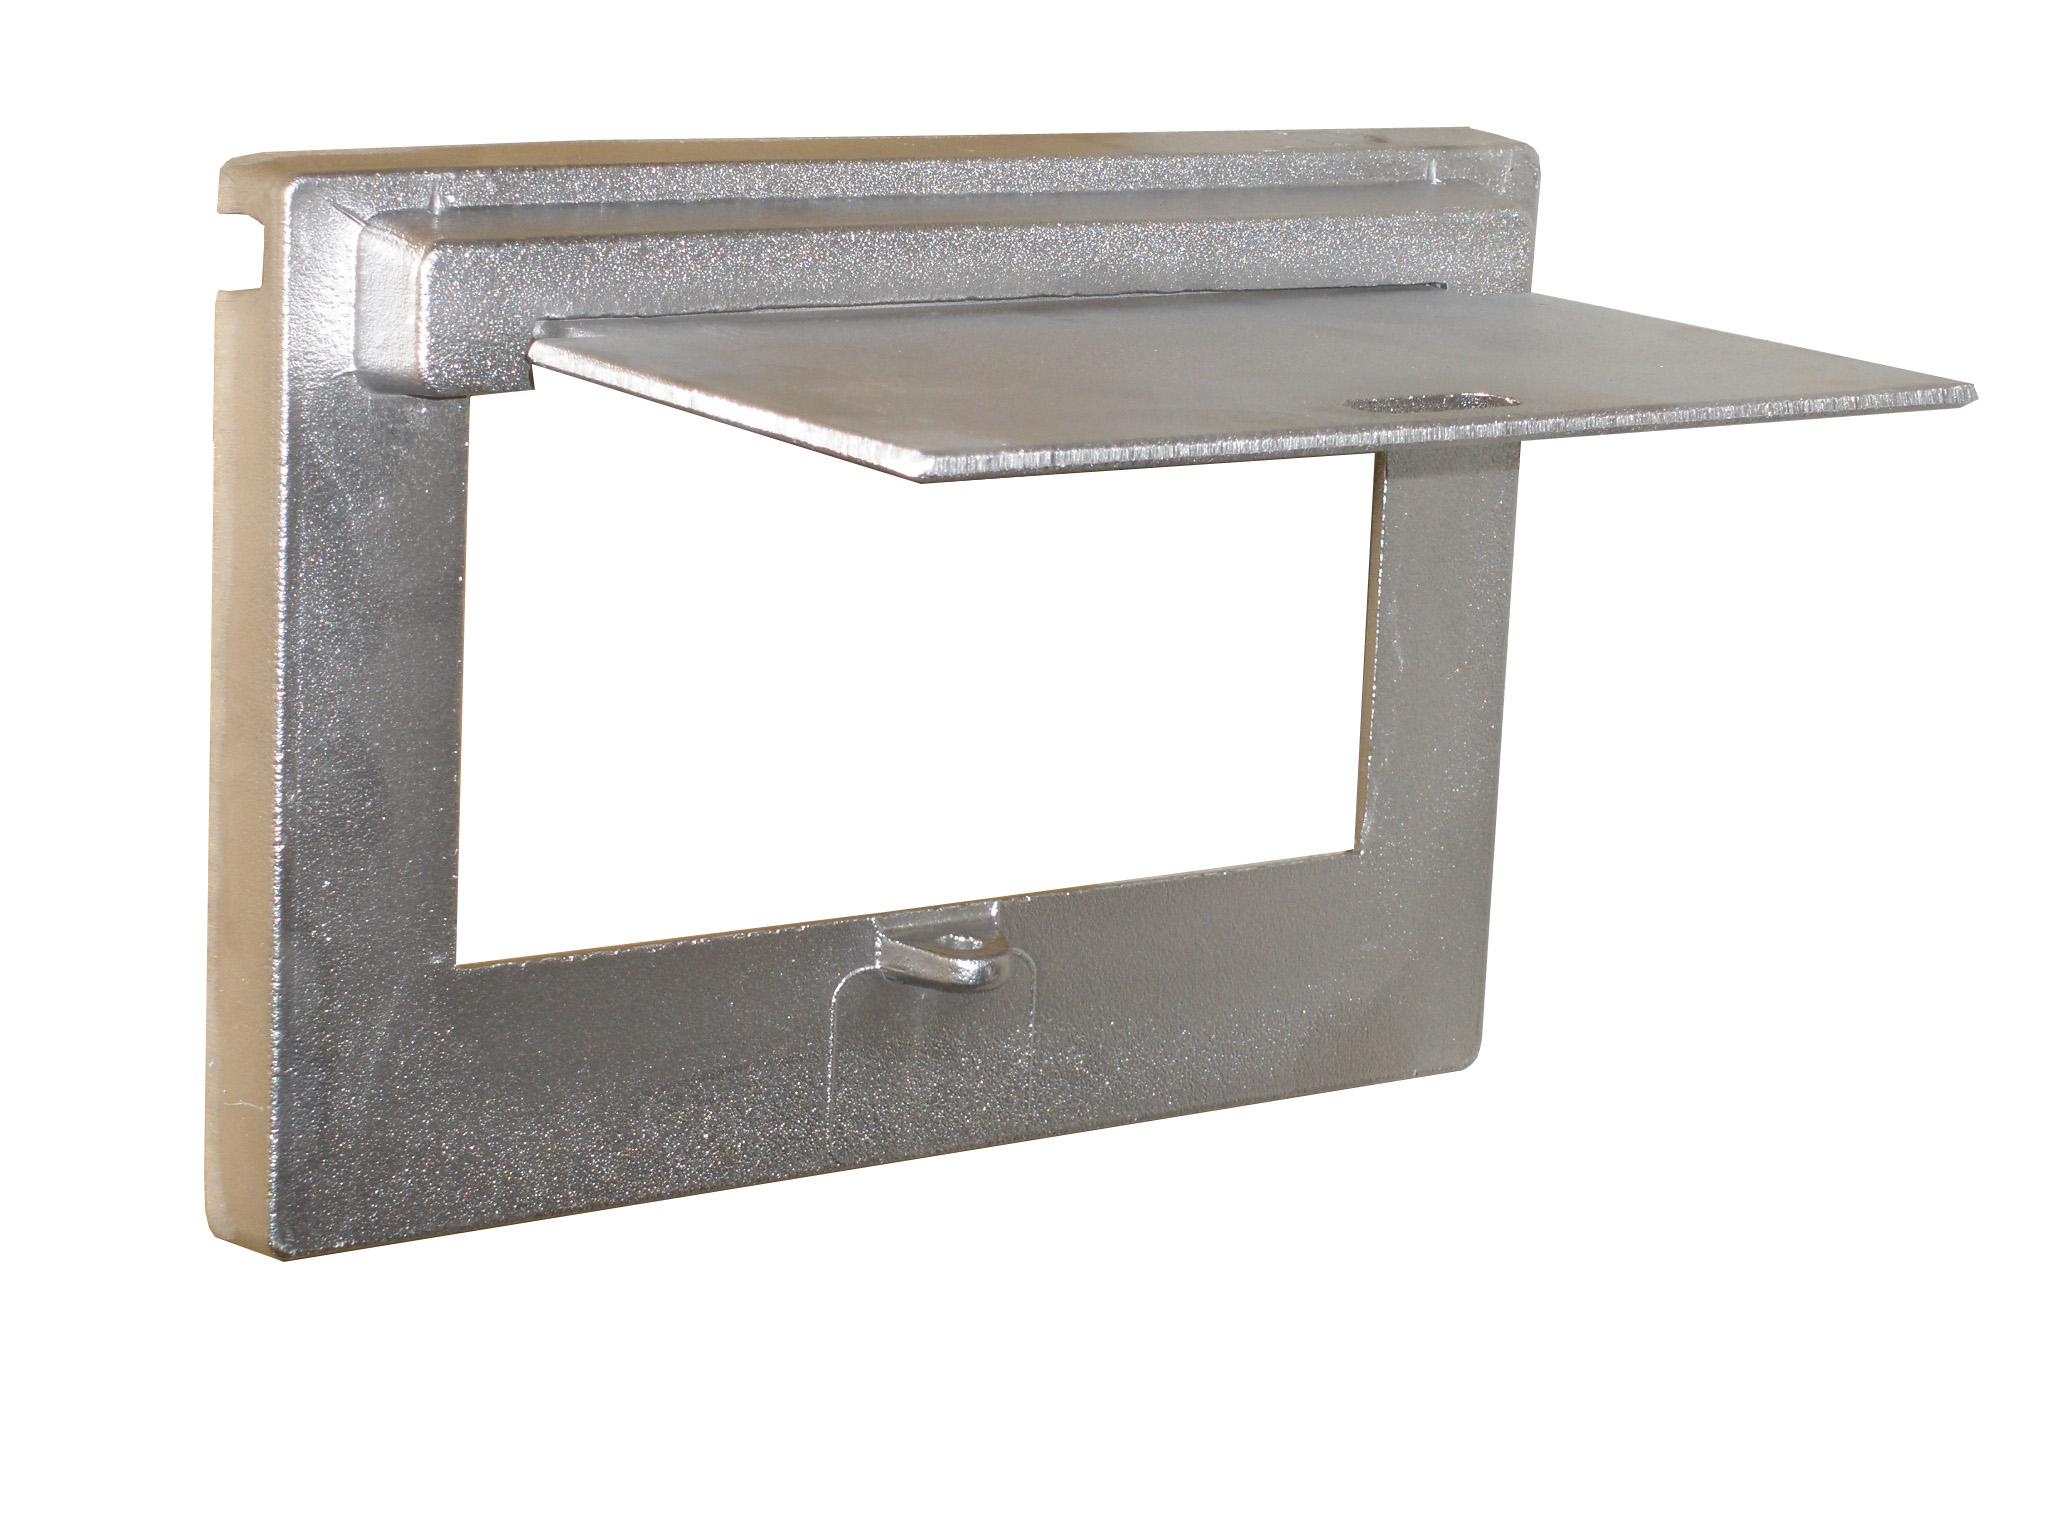 Cast Aluminium Letterbox Brick Insert Back Aluminium Finish 230 Letterboxes Mailboxes Letterboxes Nz